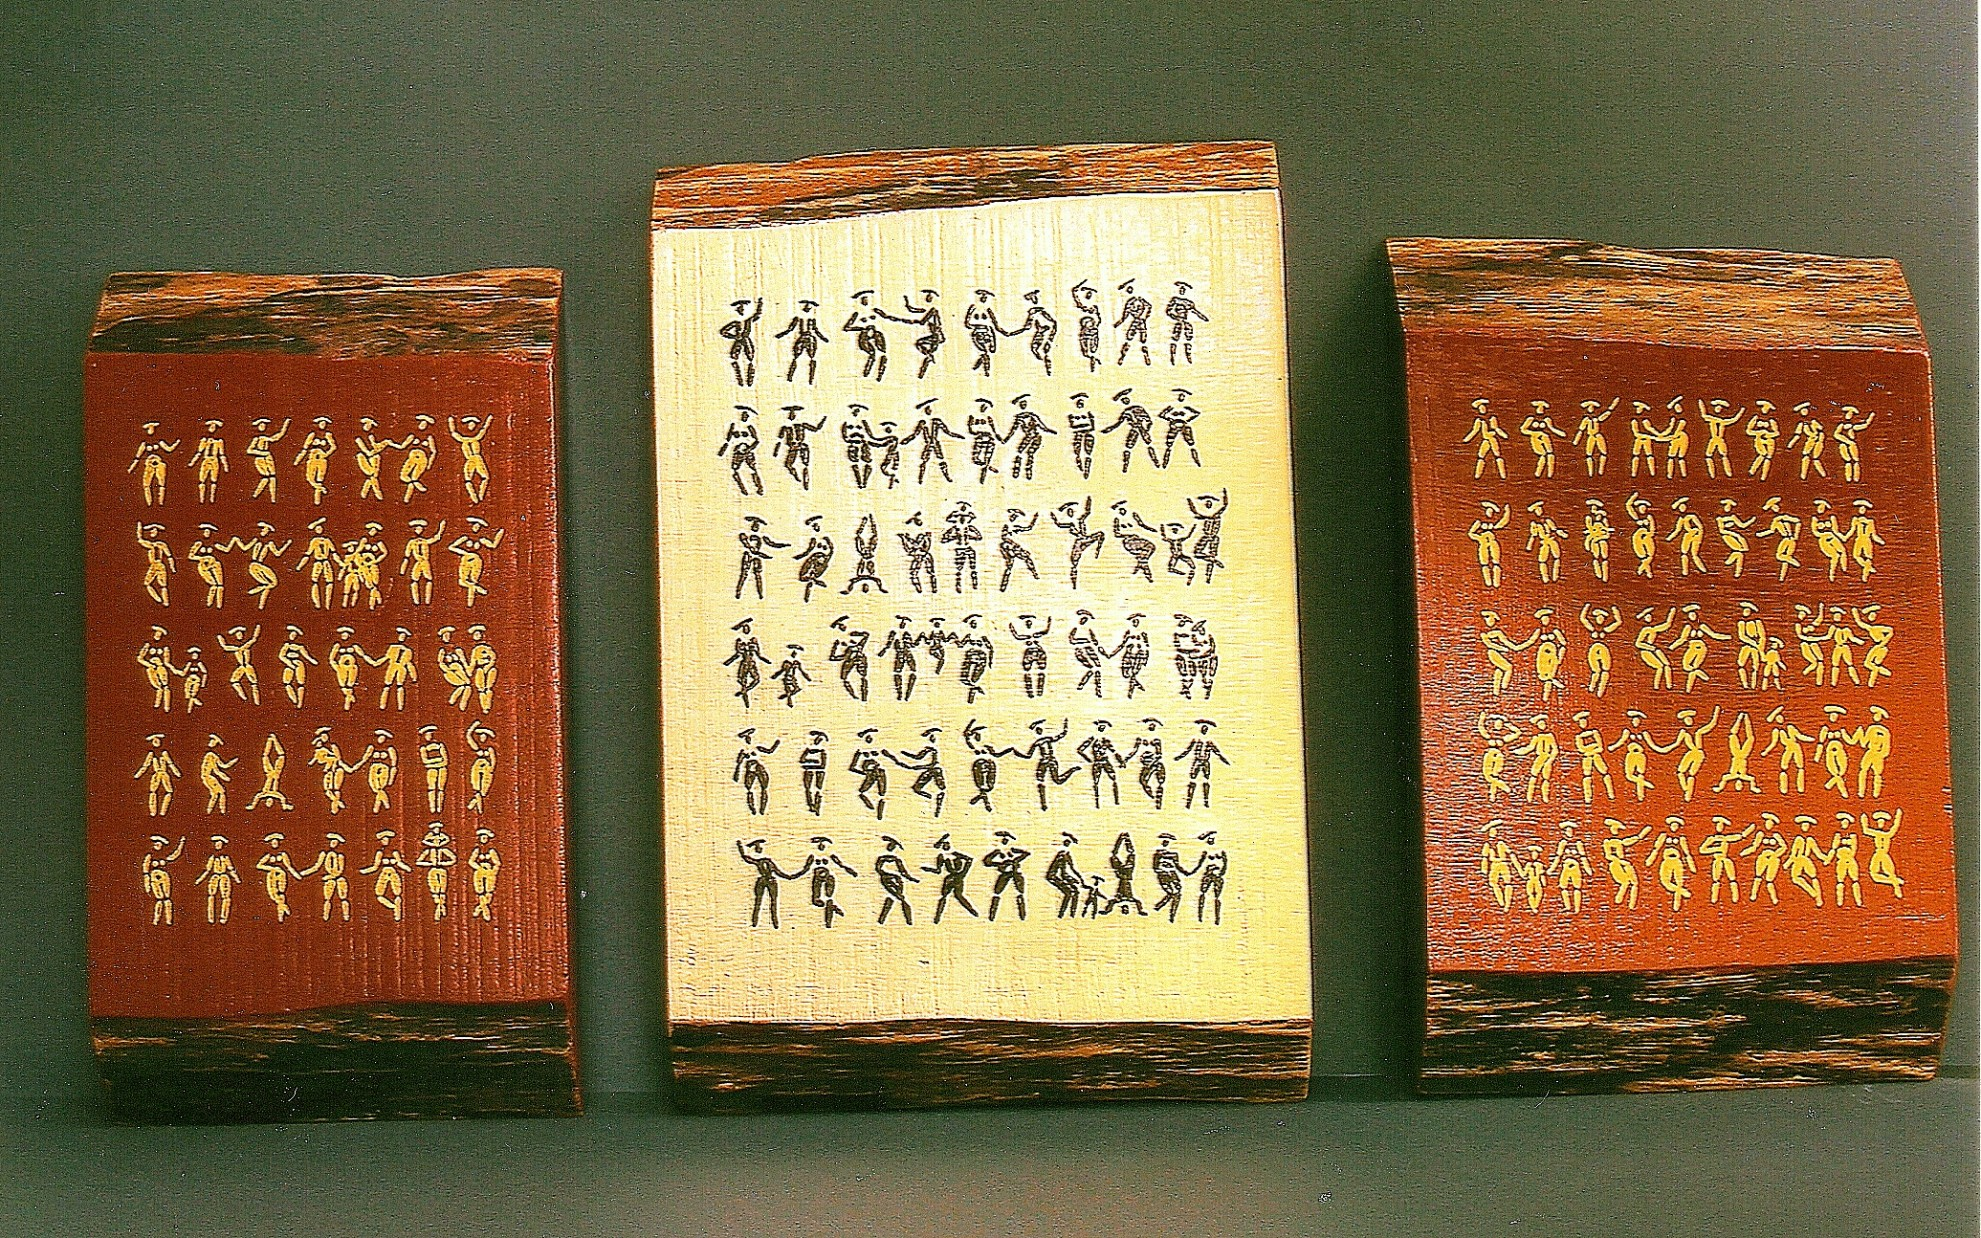 Ikonen Tanz des Lebens, 2007